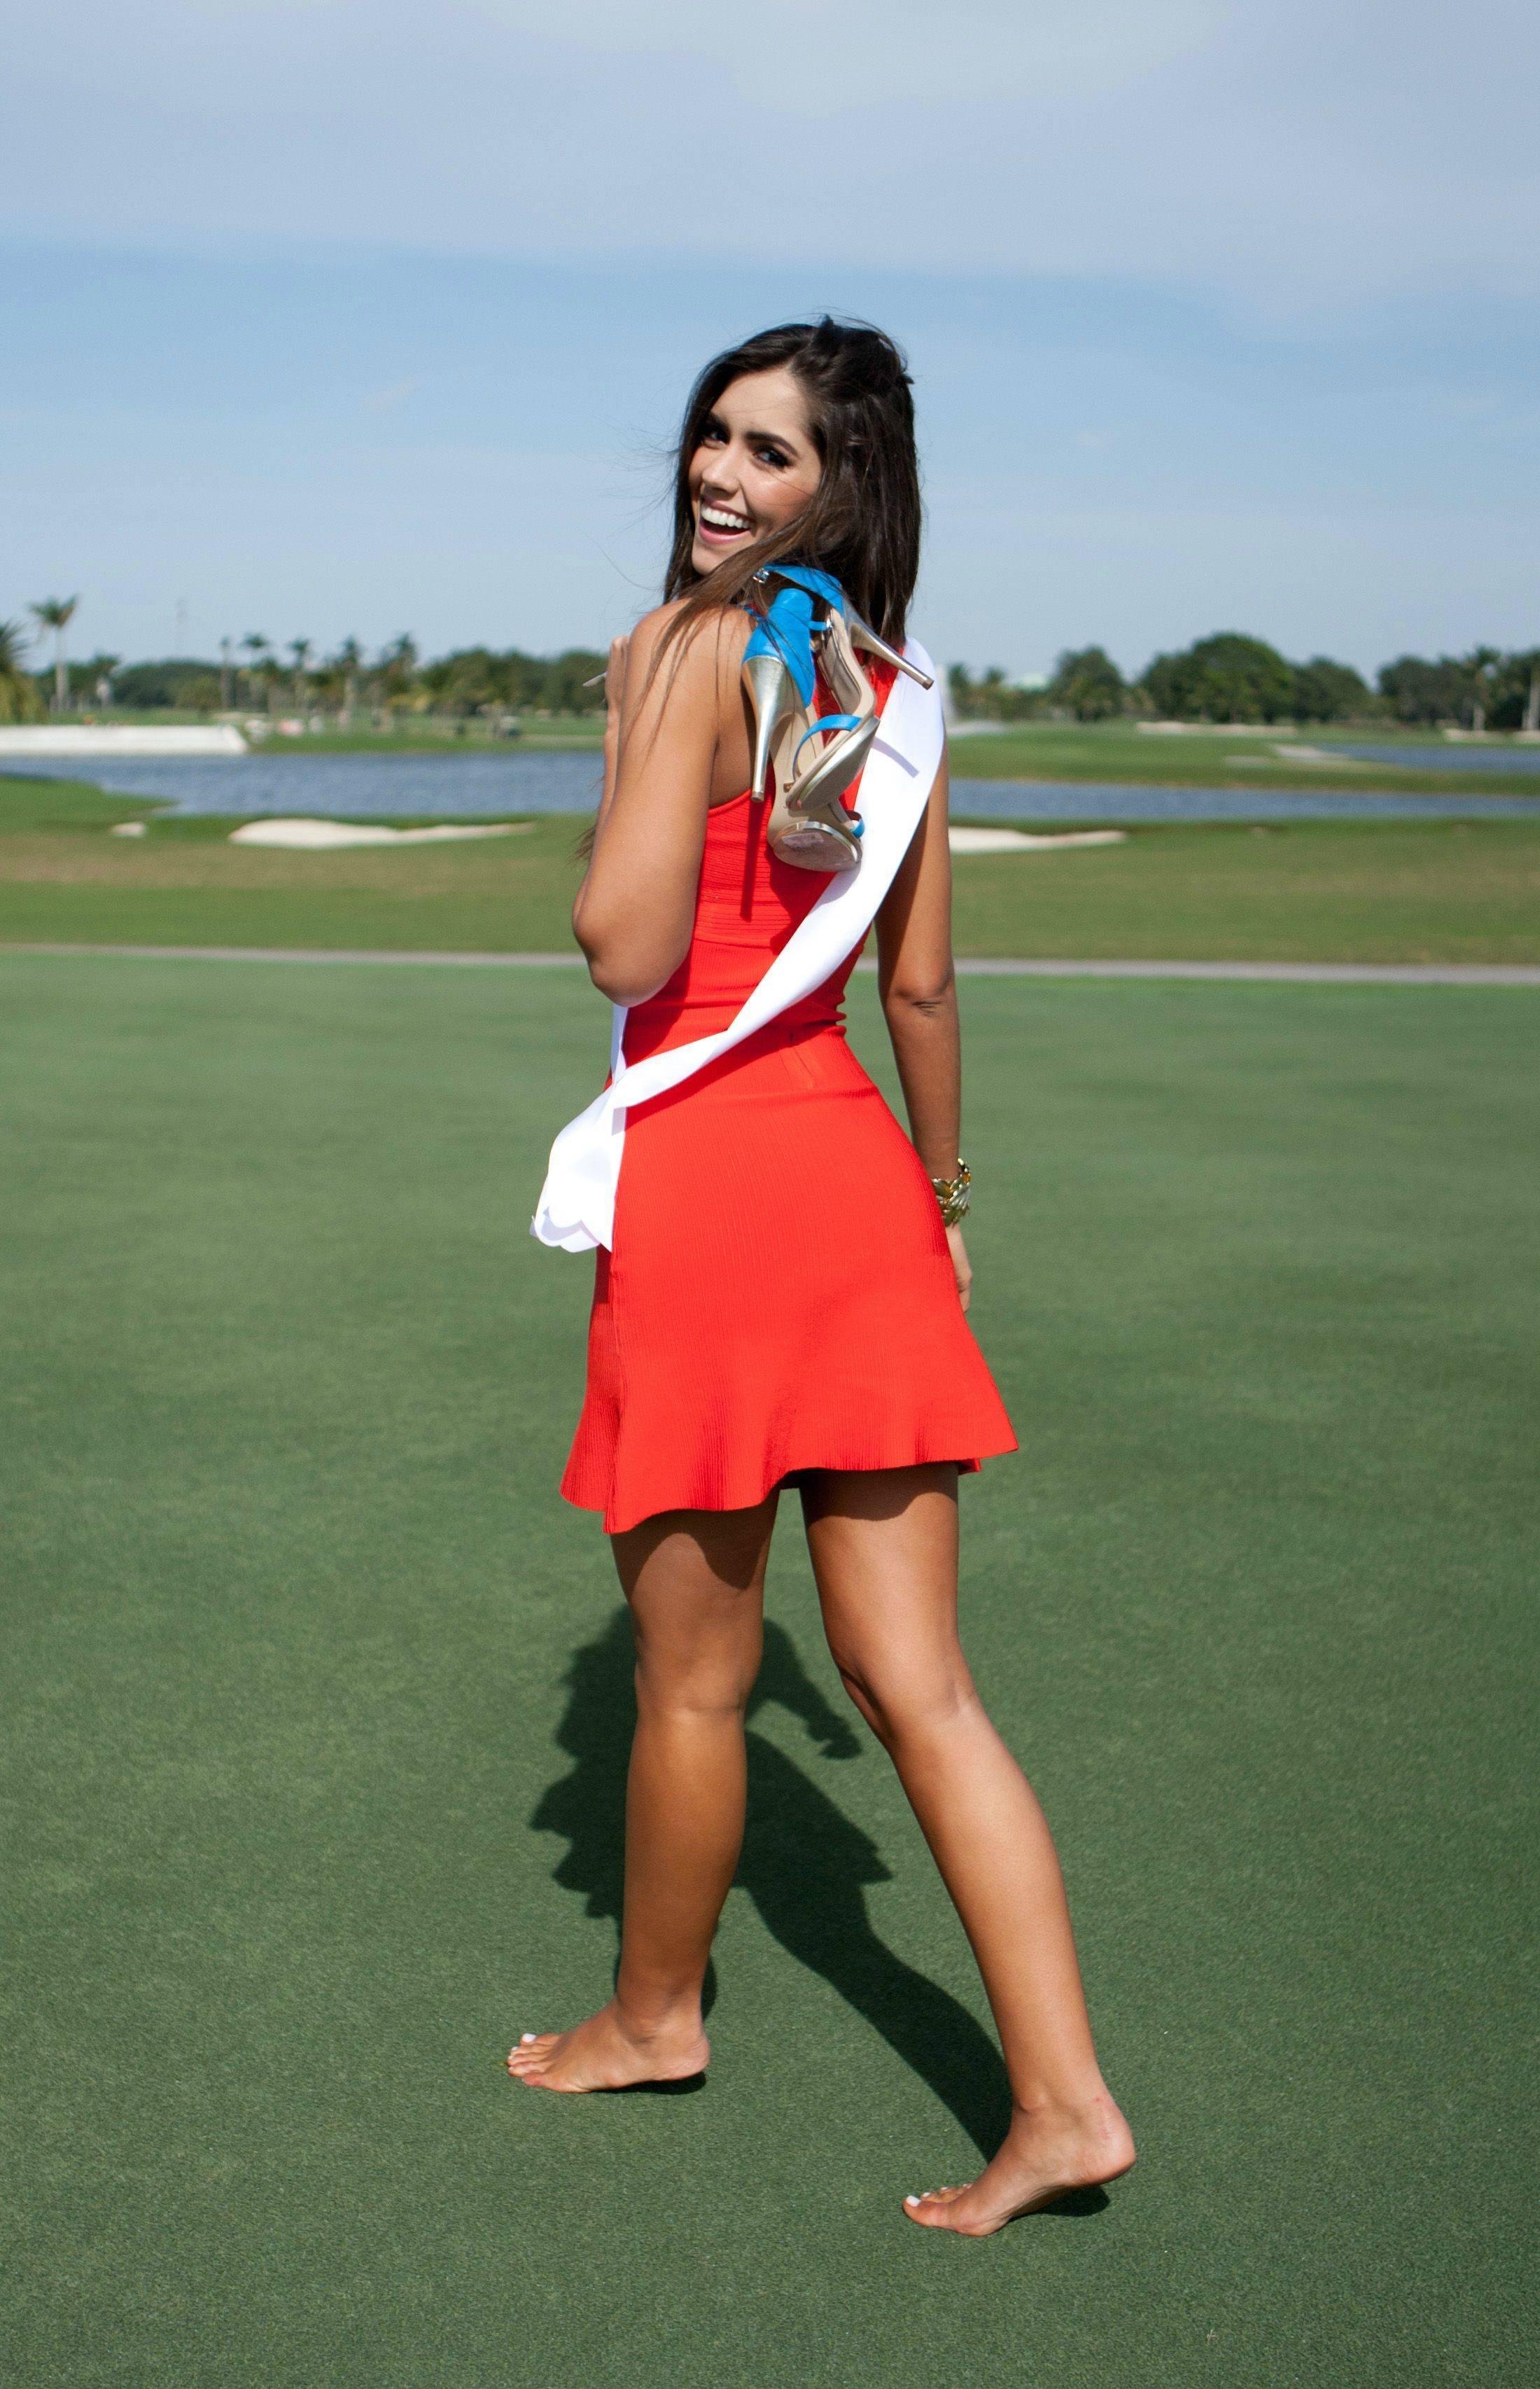 Paulina Vega Backgrounds on Wallpapers Vista